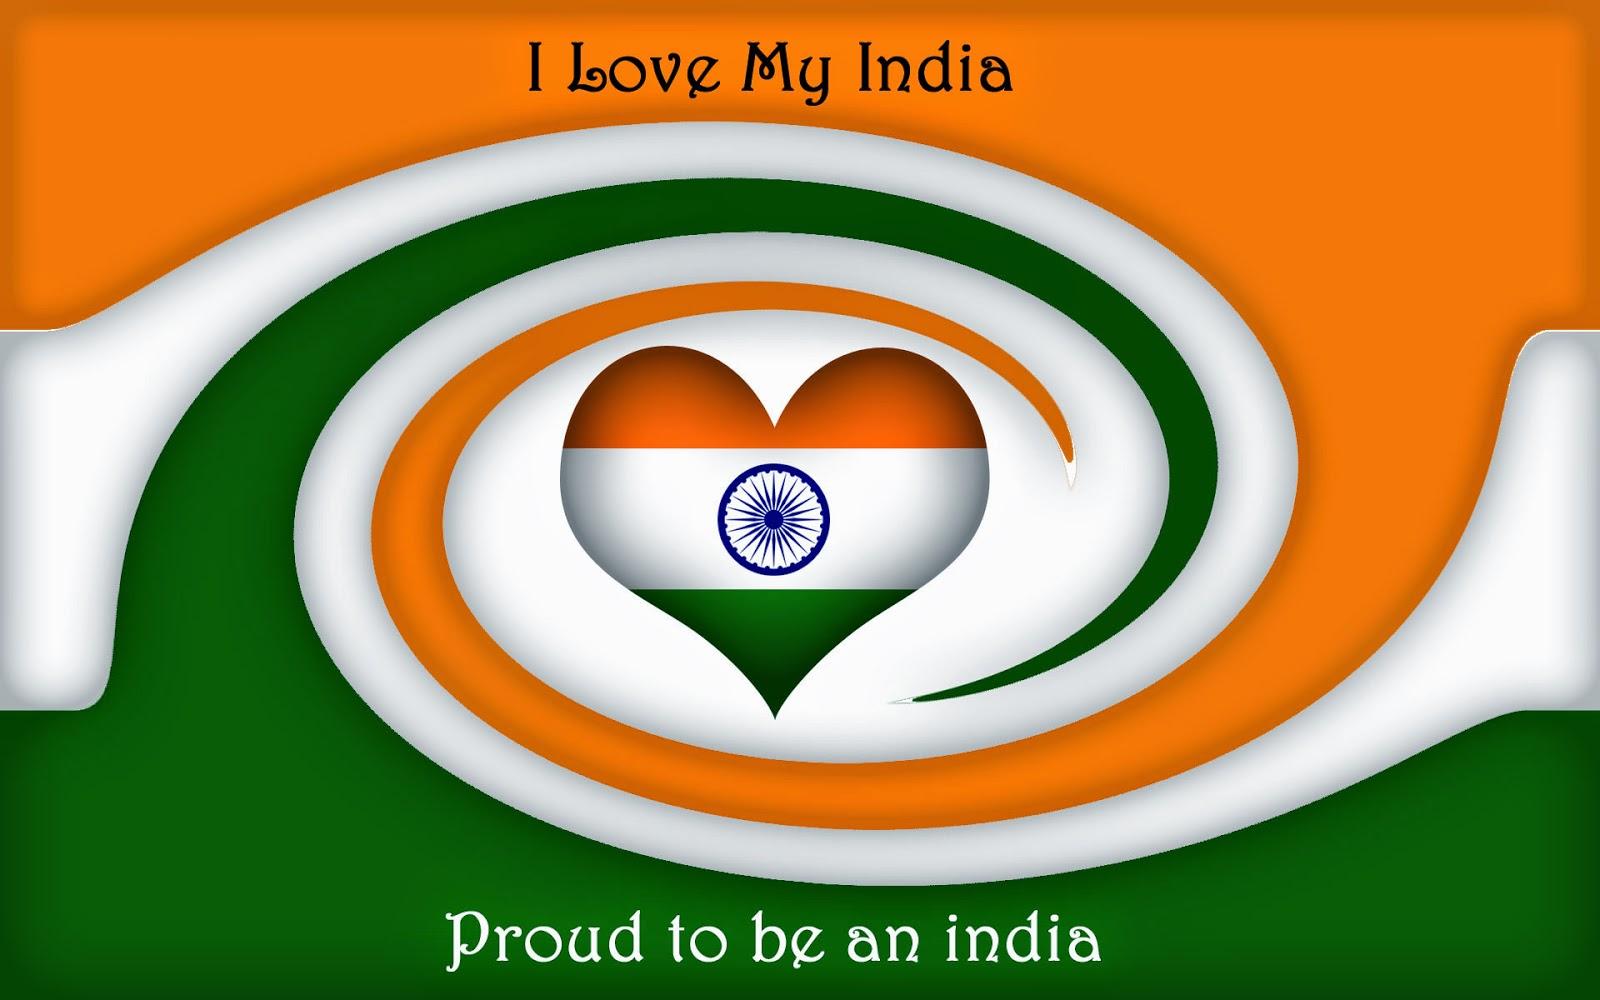 Vishal Name Love Wallpaper Hd : New kid on the block: WoW: Mother India visits